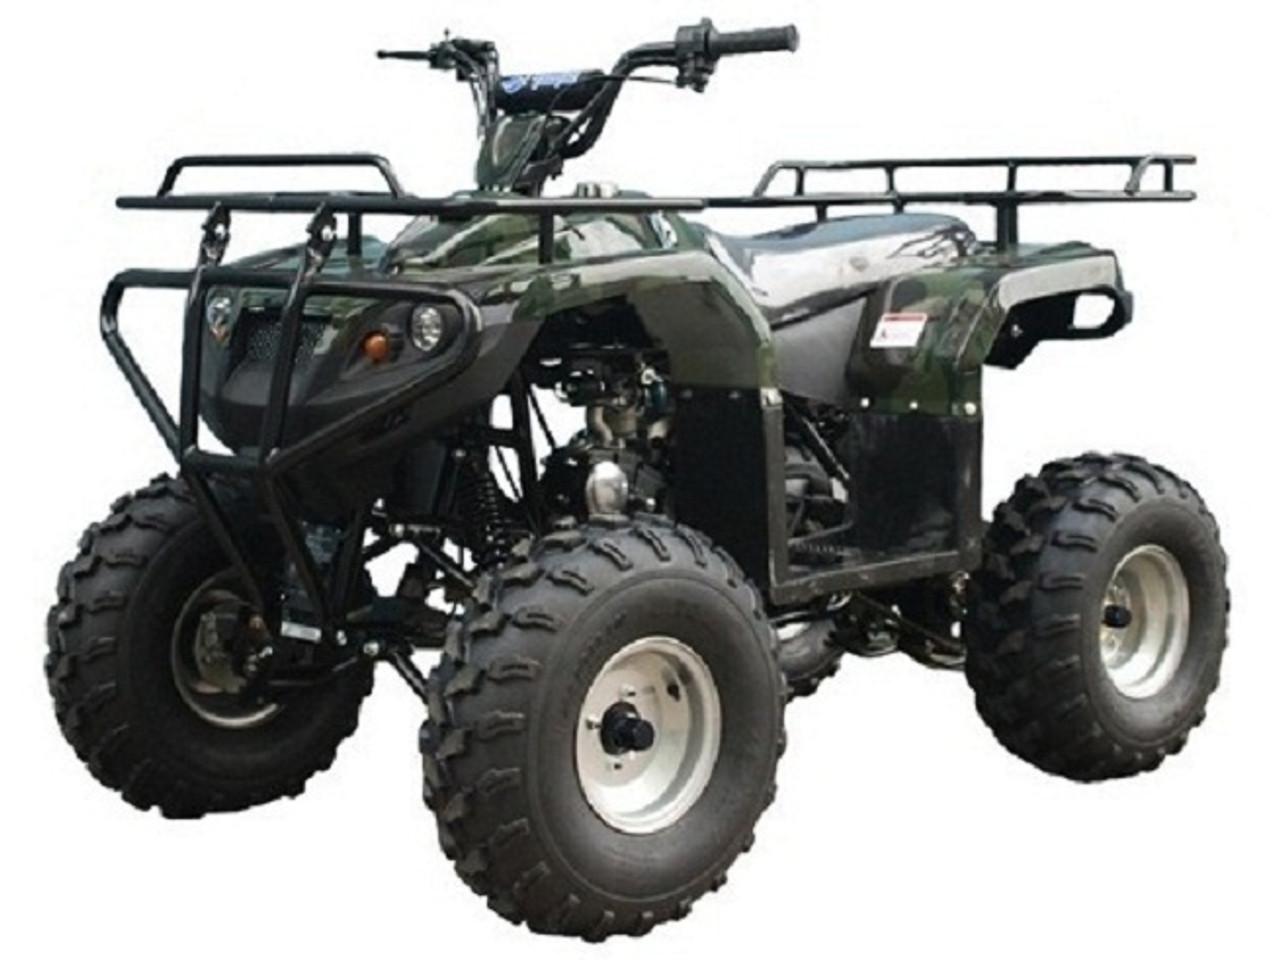 Taotao ATA 125F1, 107CC, Air Cooled, 4-Stroke, 1-Cylinder ATV